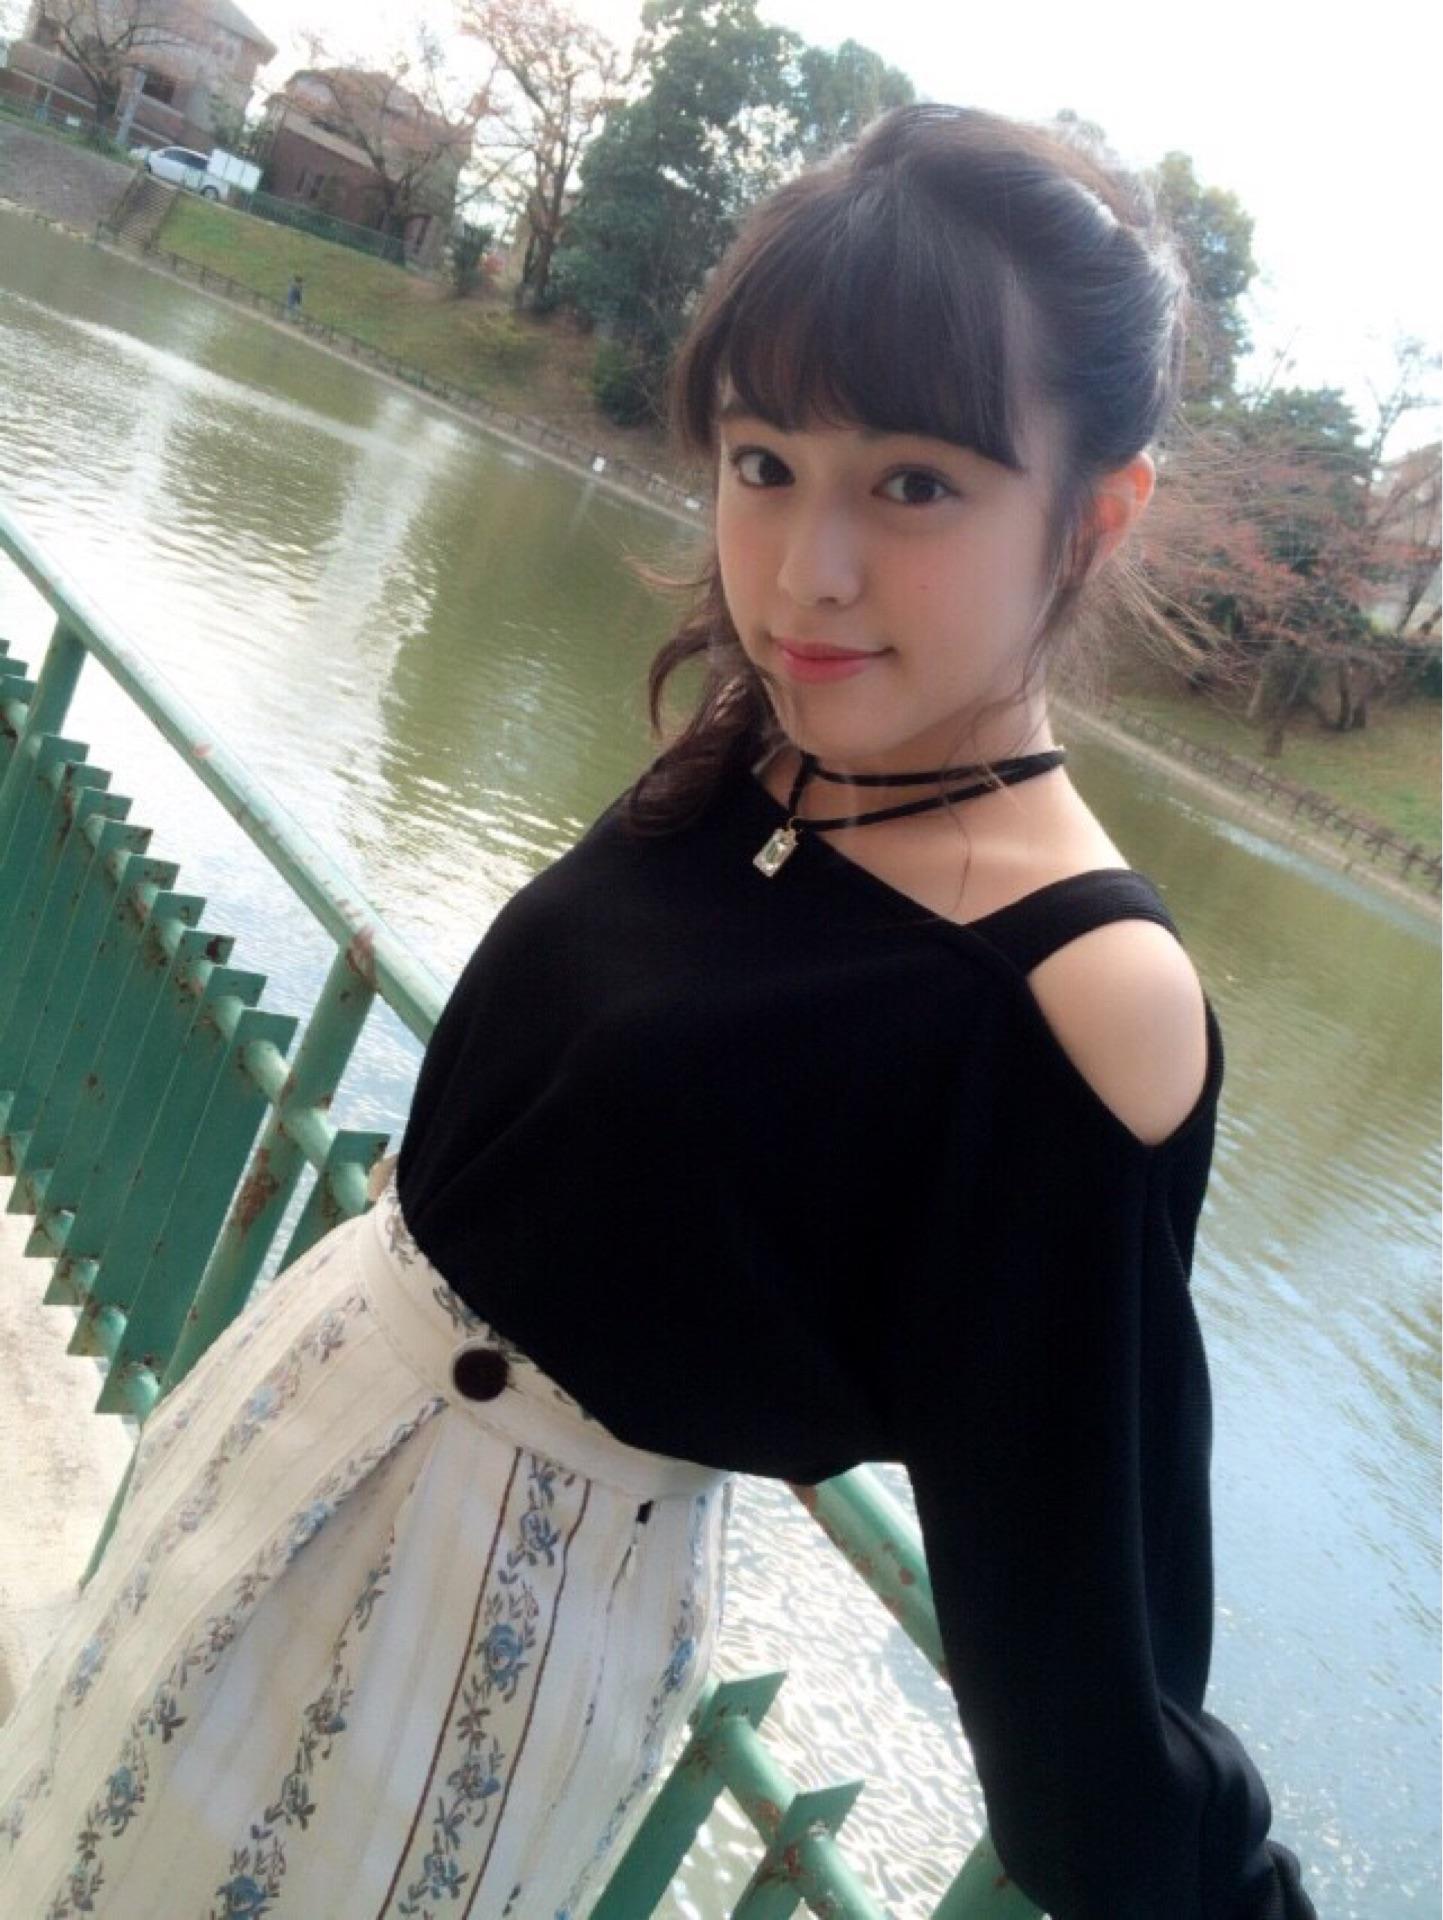 【SKE48】竹内彩姫応援スレ☆22【さきぽん】©2ch.netYouTube動画>63本 ->画像>1999枚